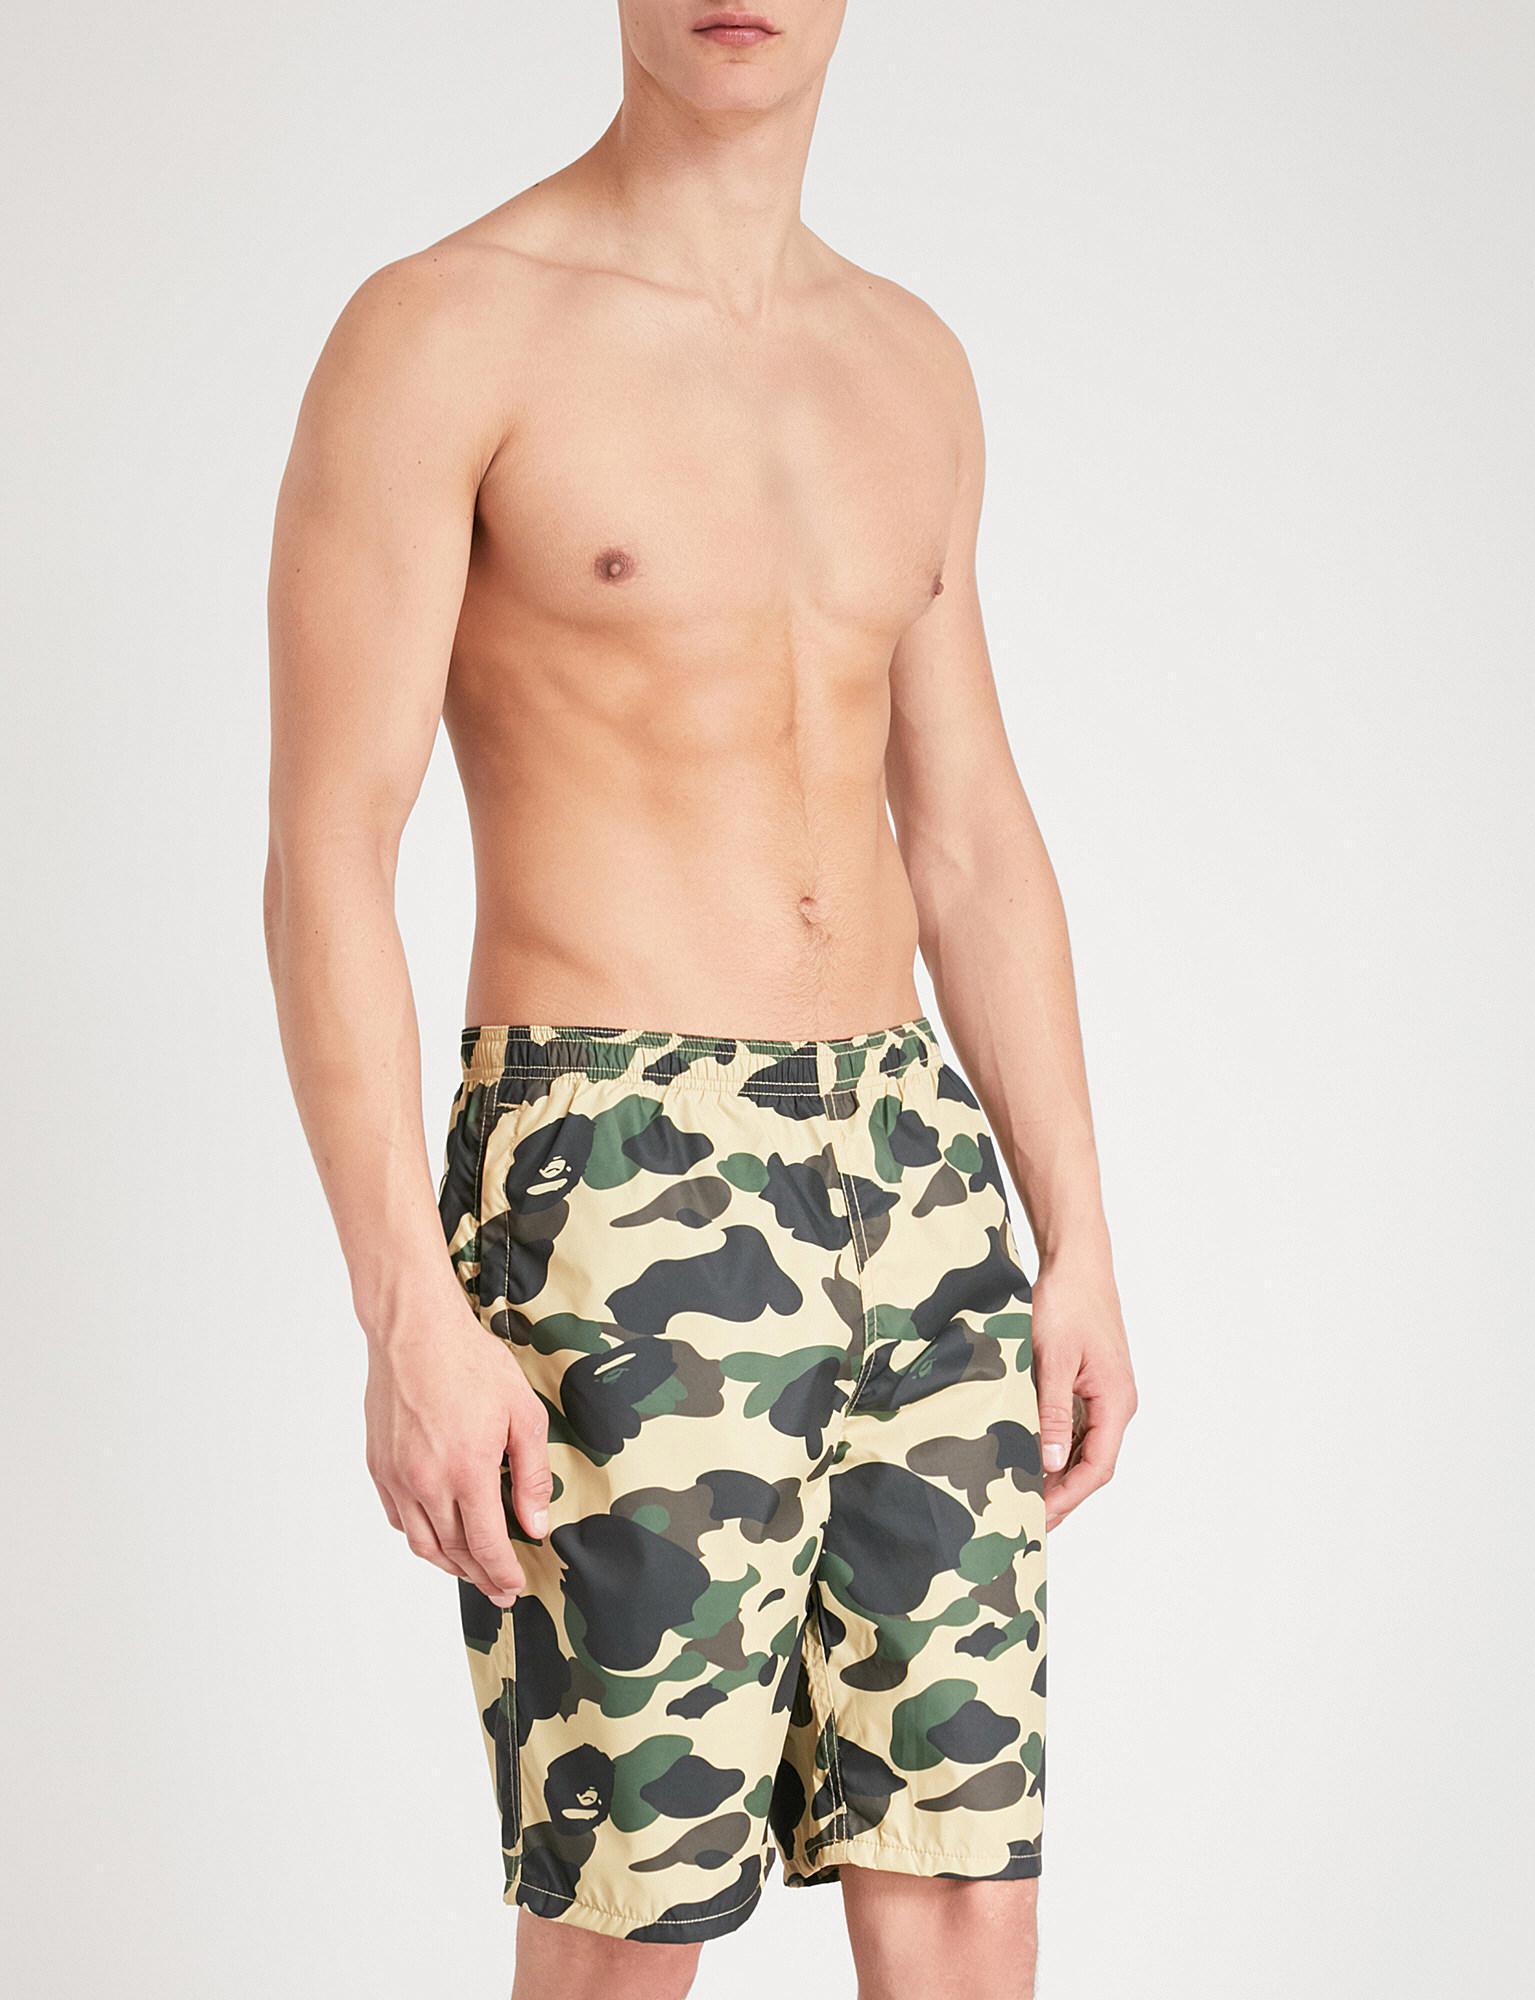 892901a120b Lyst - A Bathing Ape Camouflage Ape-print Swim Shorts in Green for Men